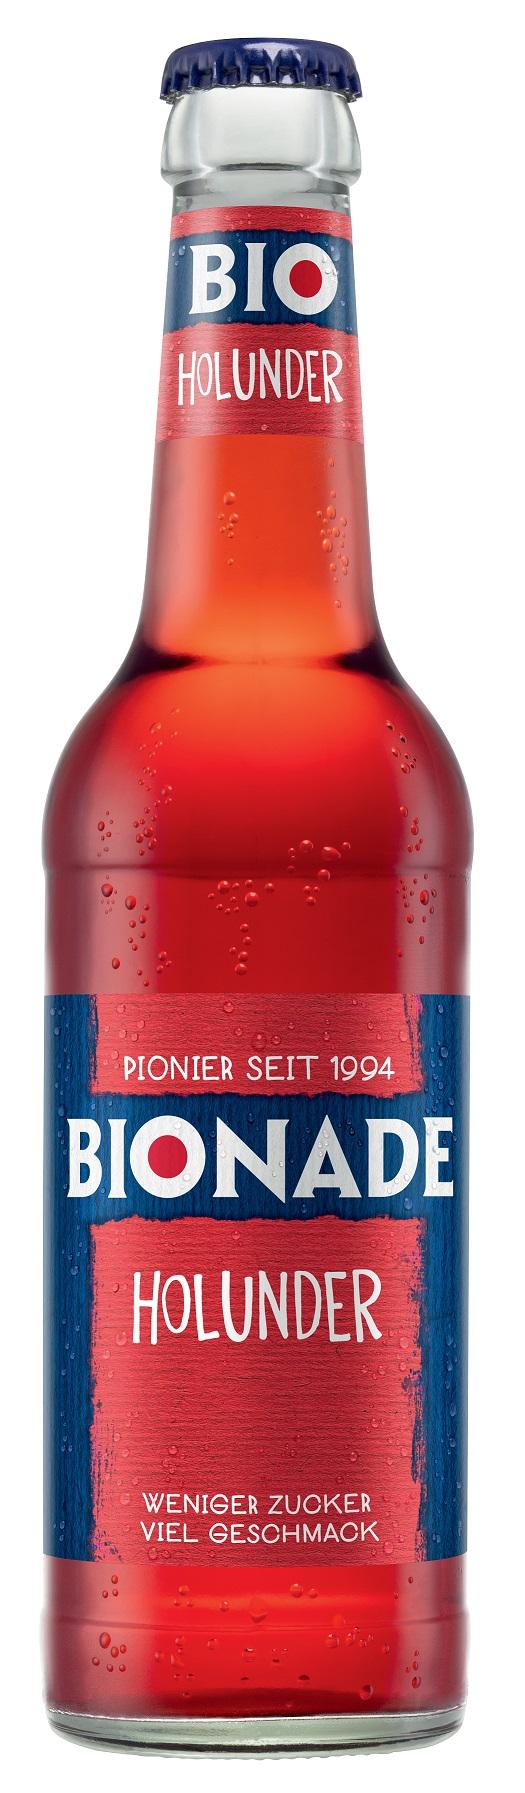 Bionade Holunder